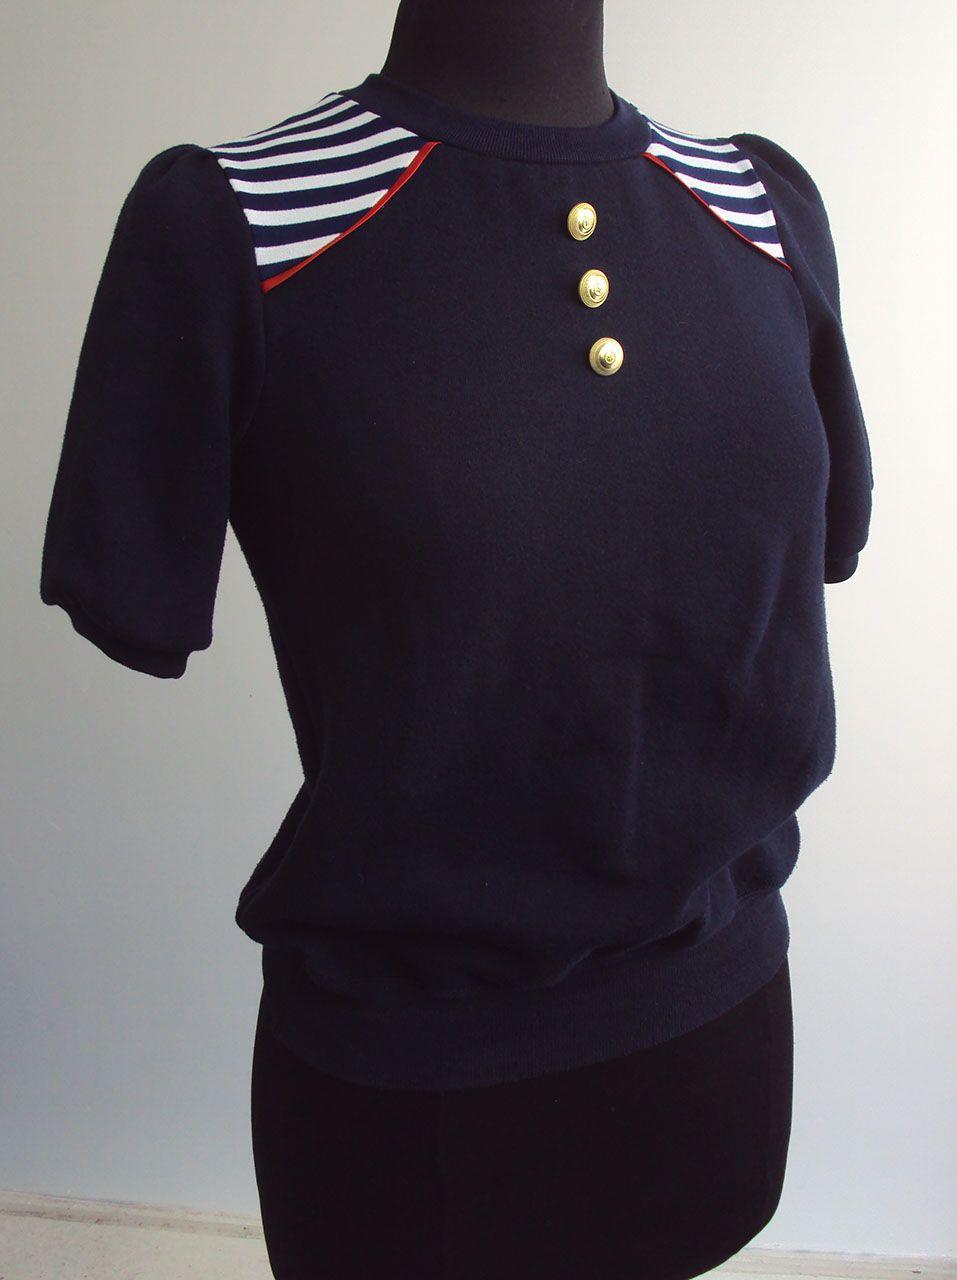 'So, Zo...': Refashion Friday Inspiration: Contrast Shoulder Panel Sweatshirt